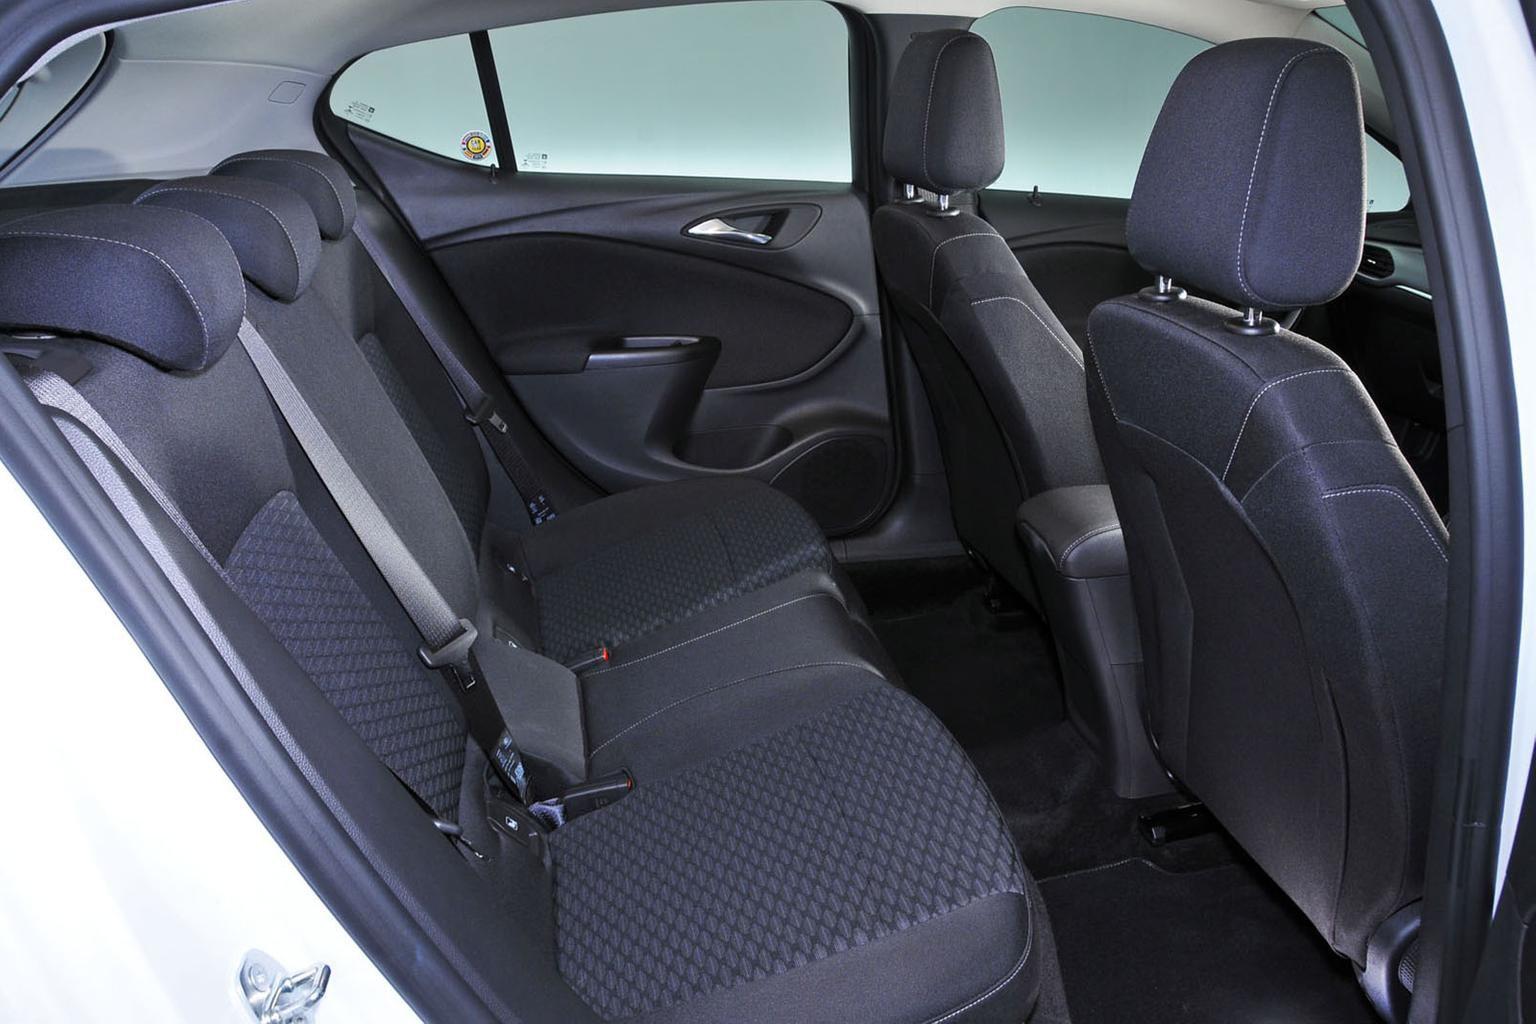 Fiat Tipo vs Vauxhall Astra